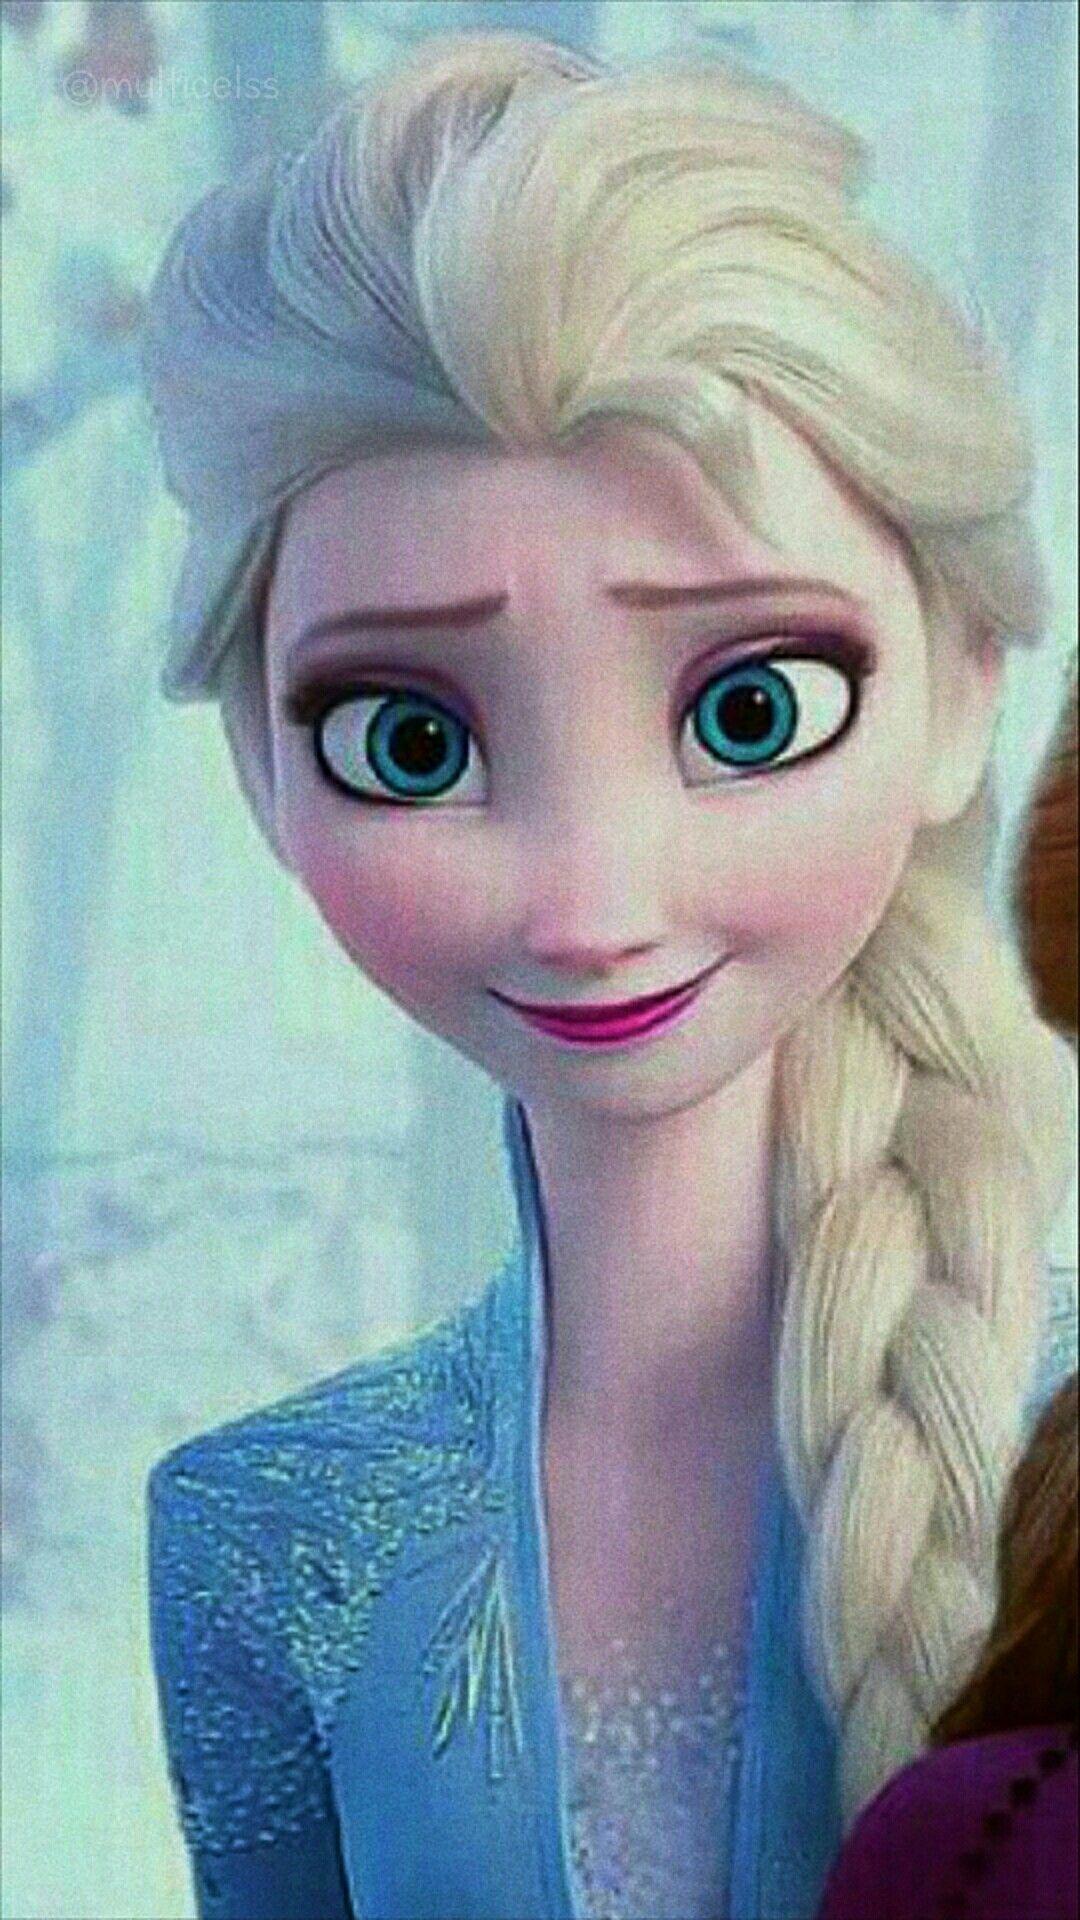 Frozen Wallpaper Elsa Pt 1 In 2020 Disney Princess Pictures Frozen Wallpaper Princess Pictures